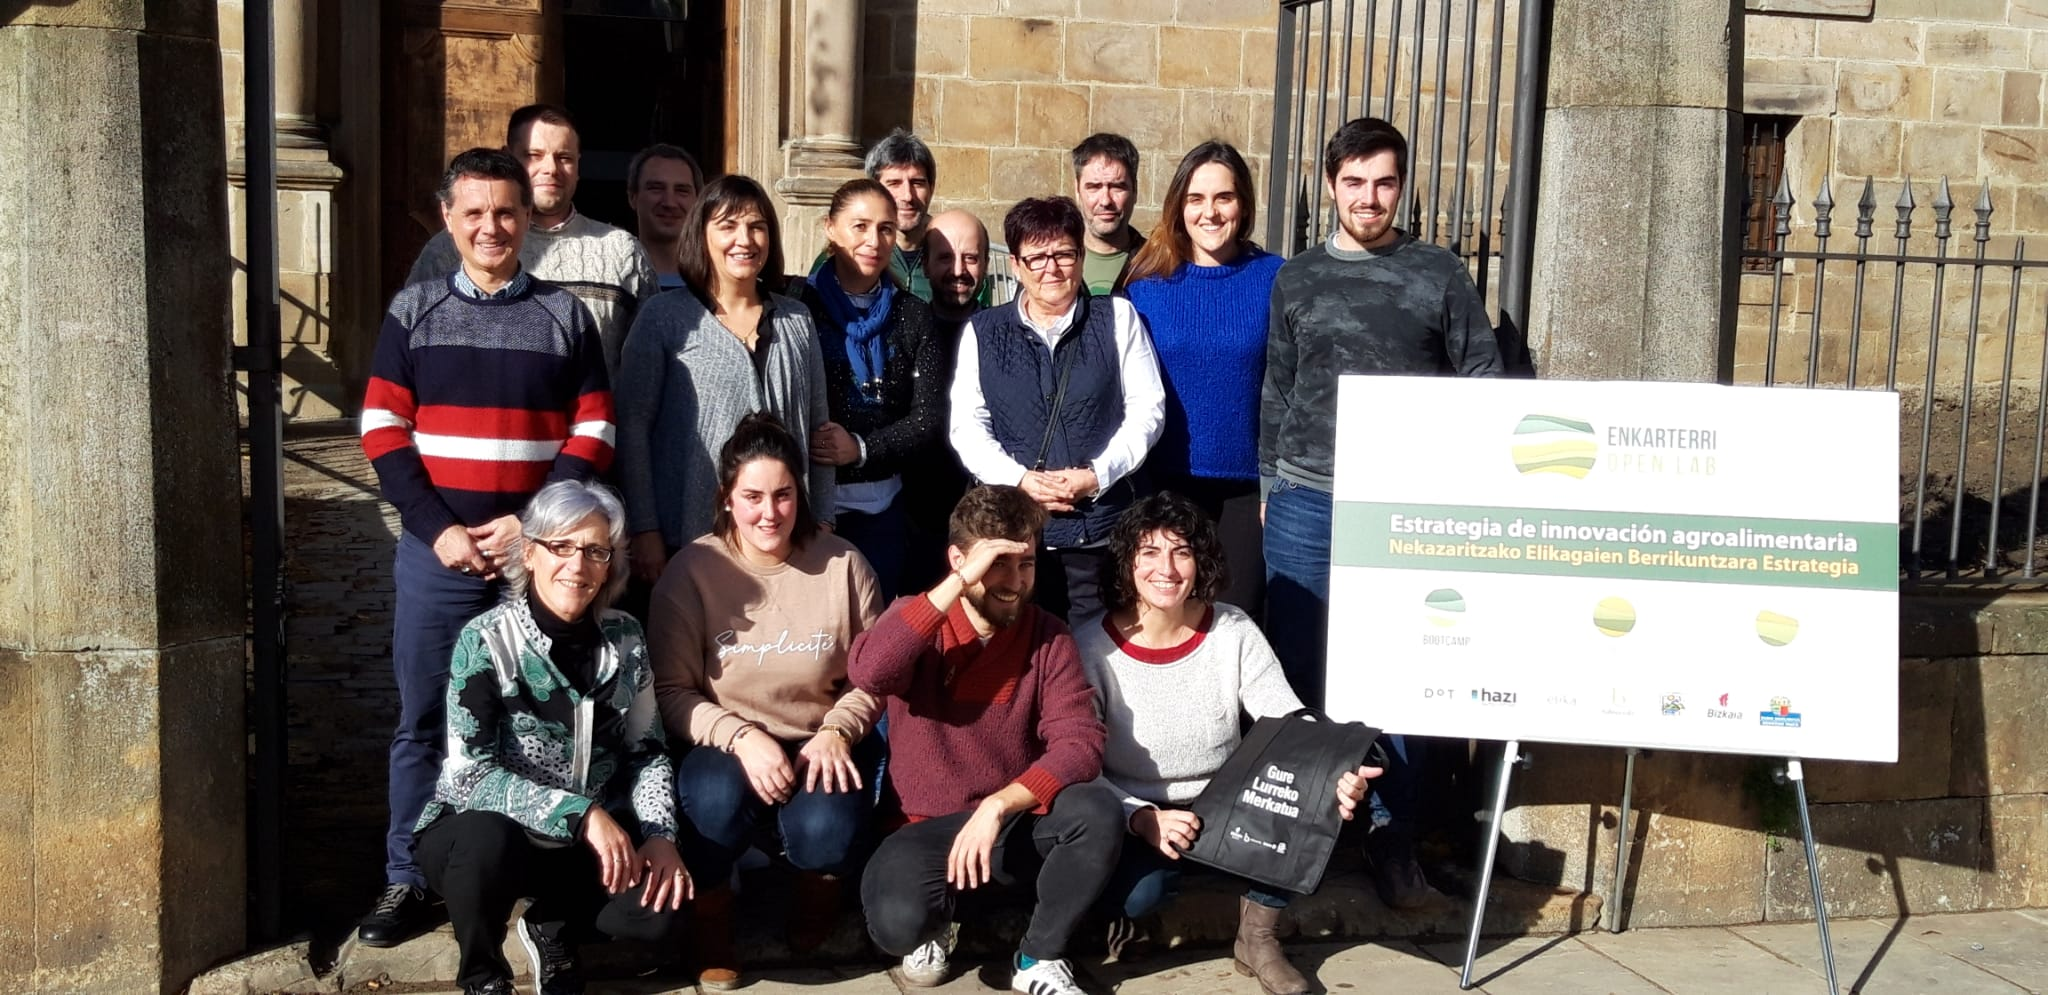 team_enkarterri open lab_ agrofood_social innovation _ agro innovation_urban rural gap_rural innovation_food innovation_DOT_design_bilbao_bizkaia